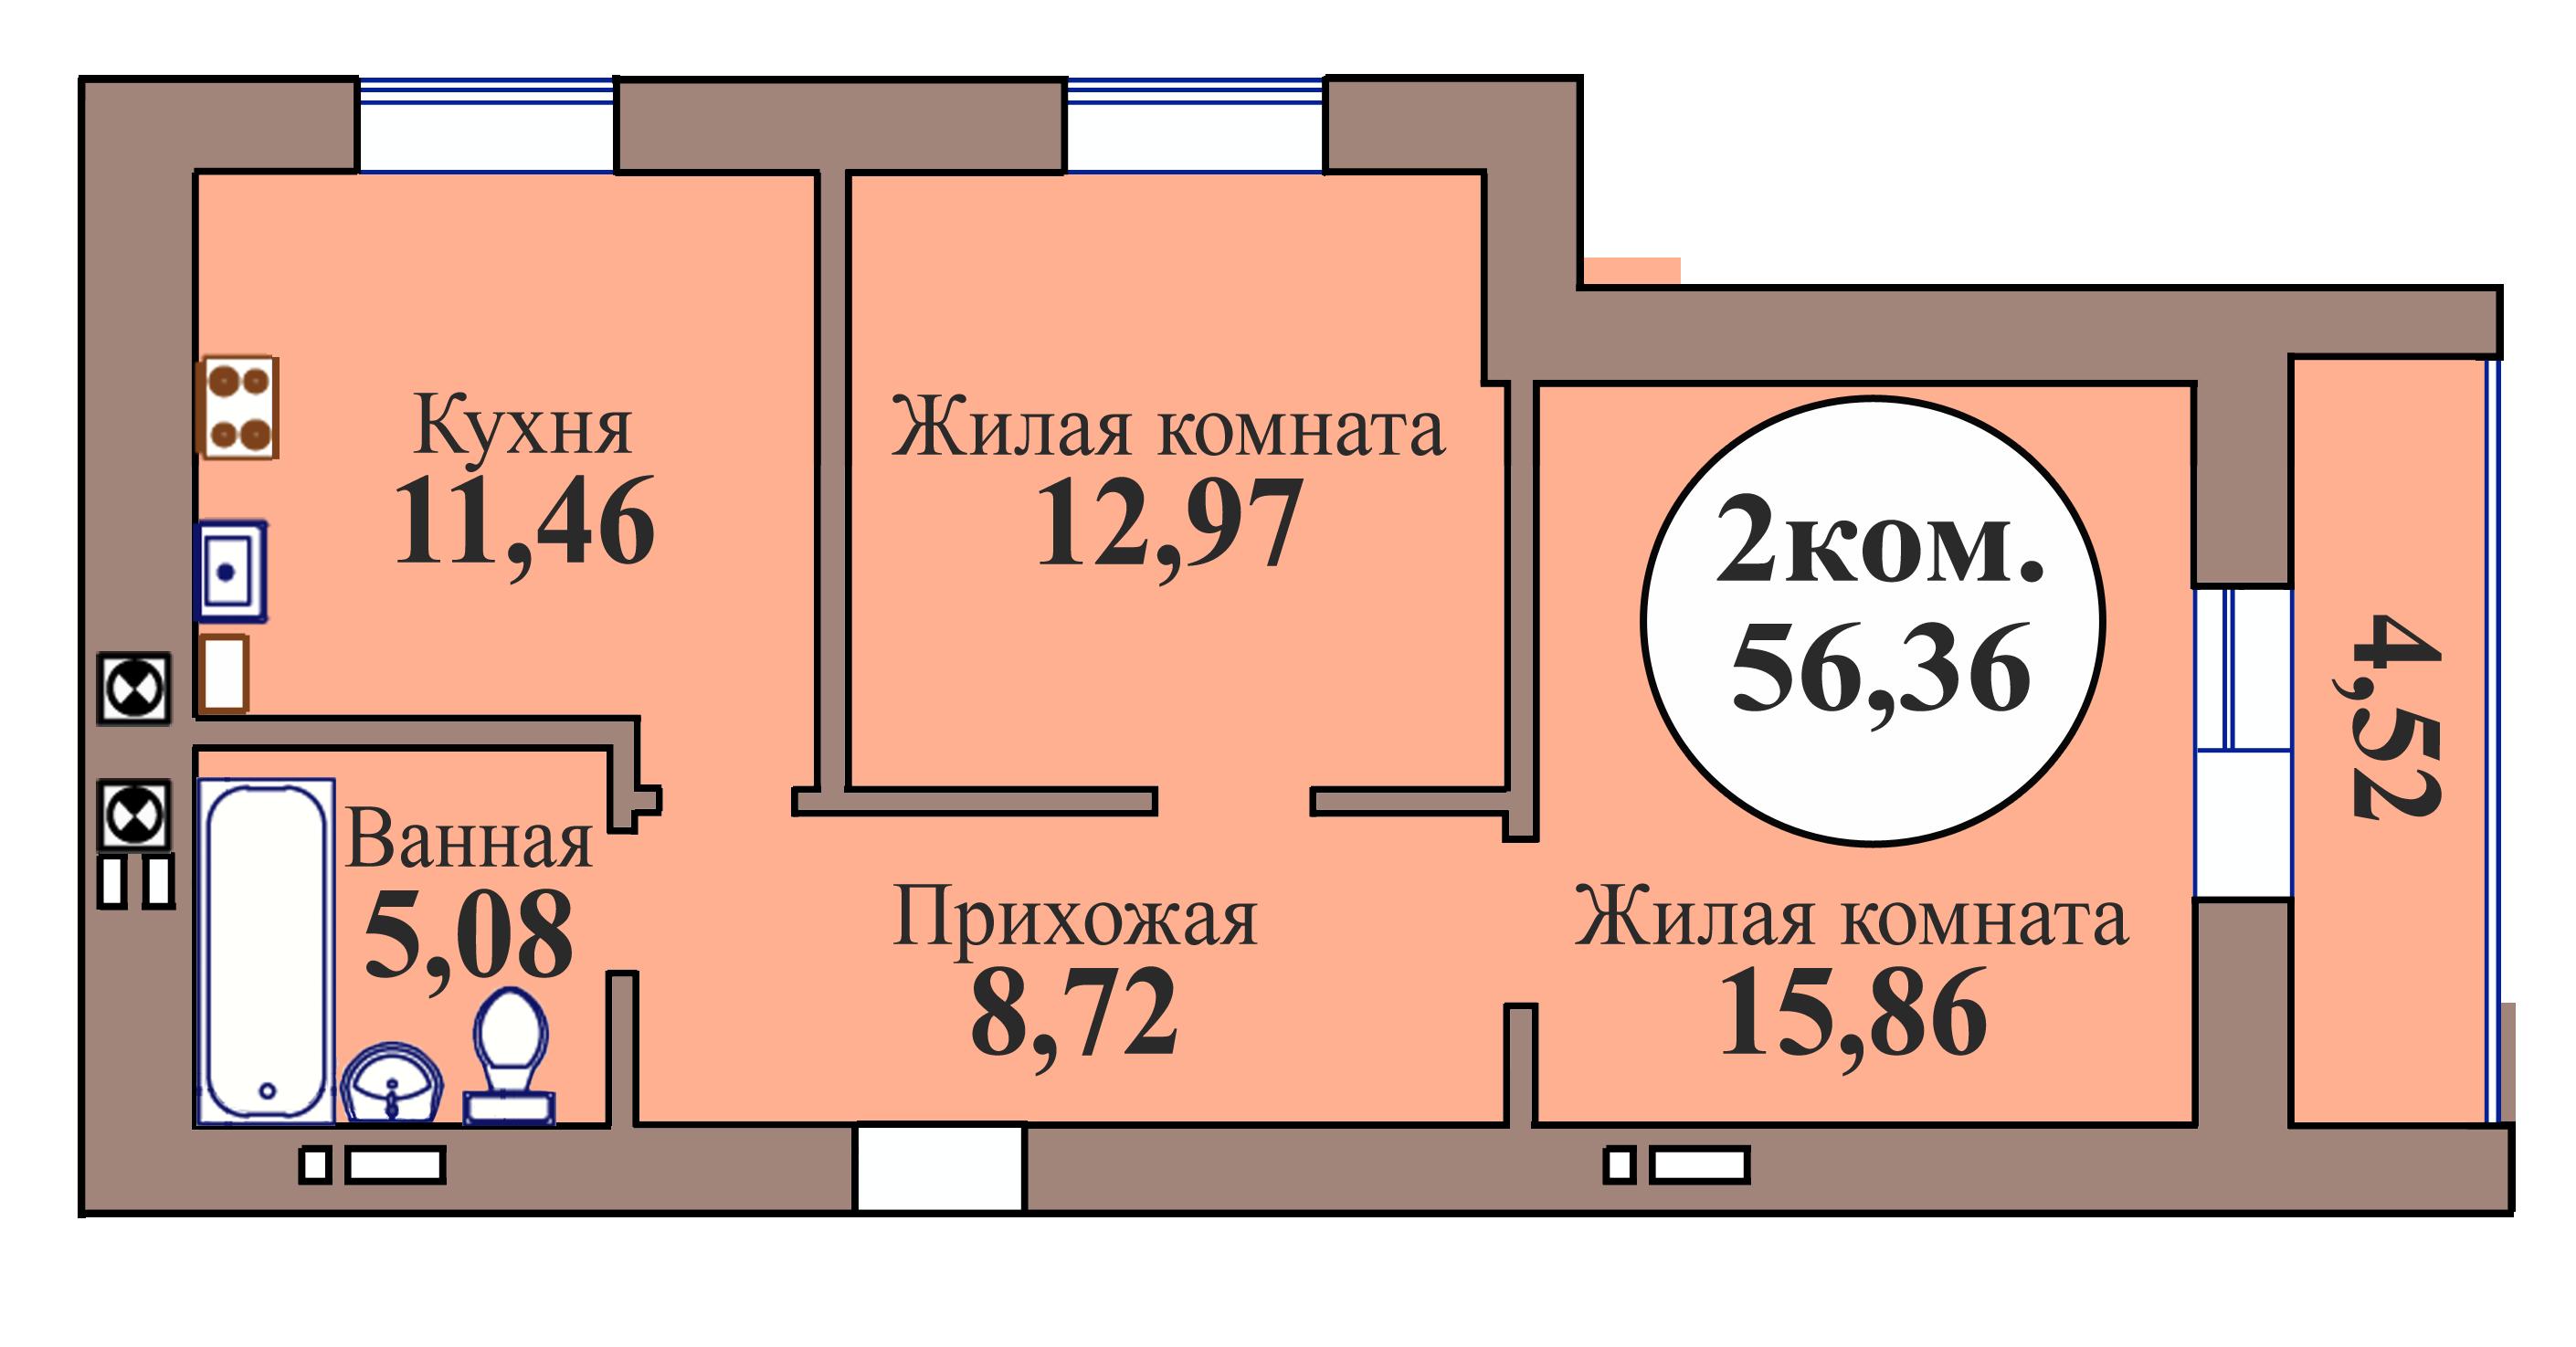 2-комн. кв. по пер. Калининградский, 5 кв. 134 в Калининграде